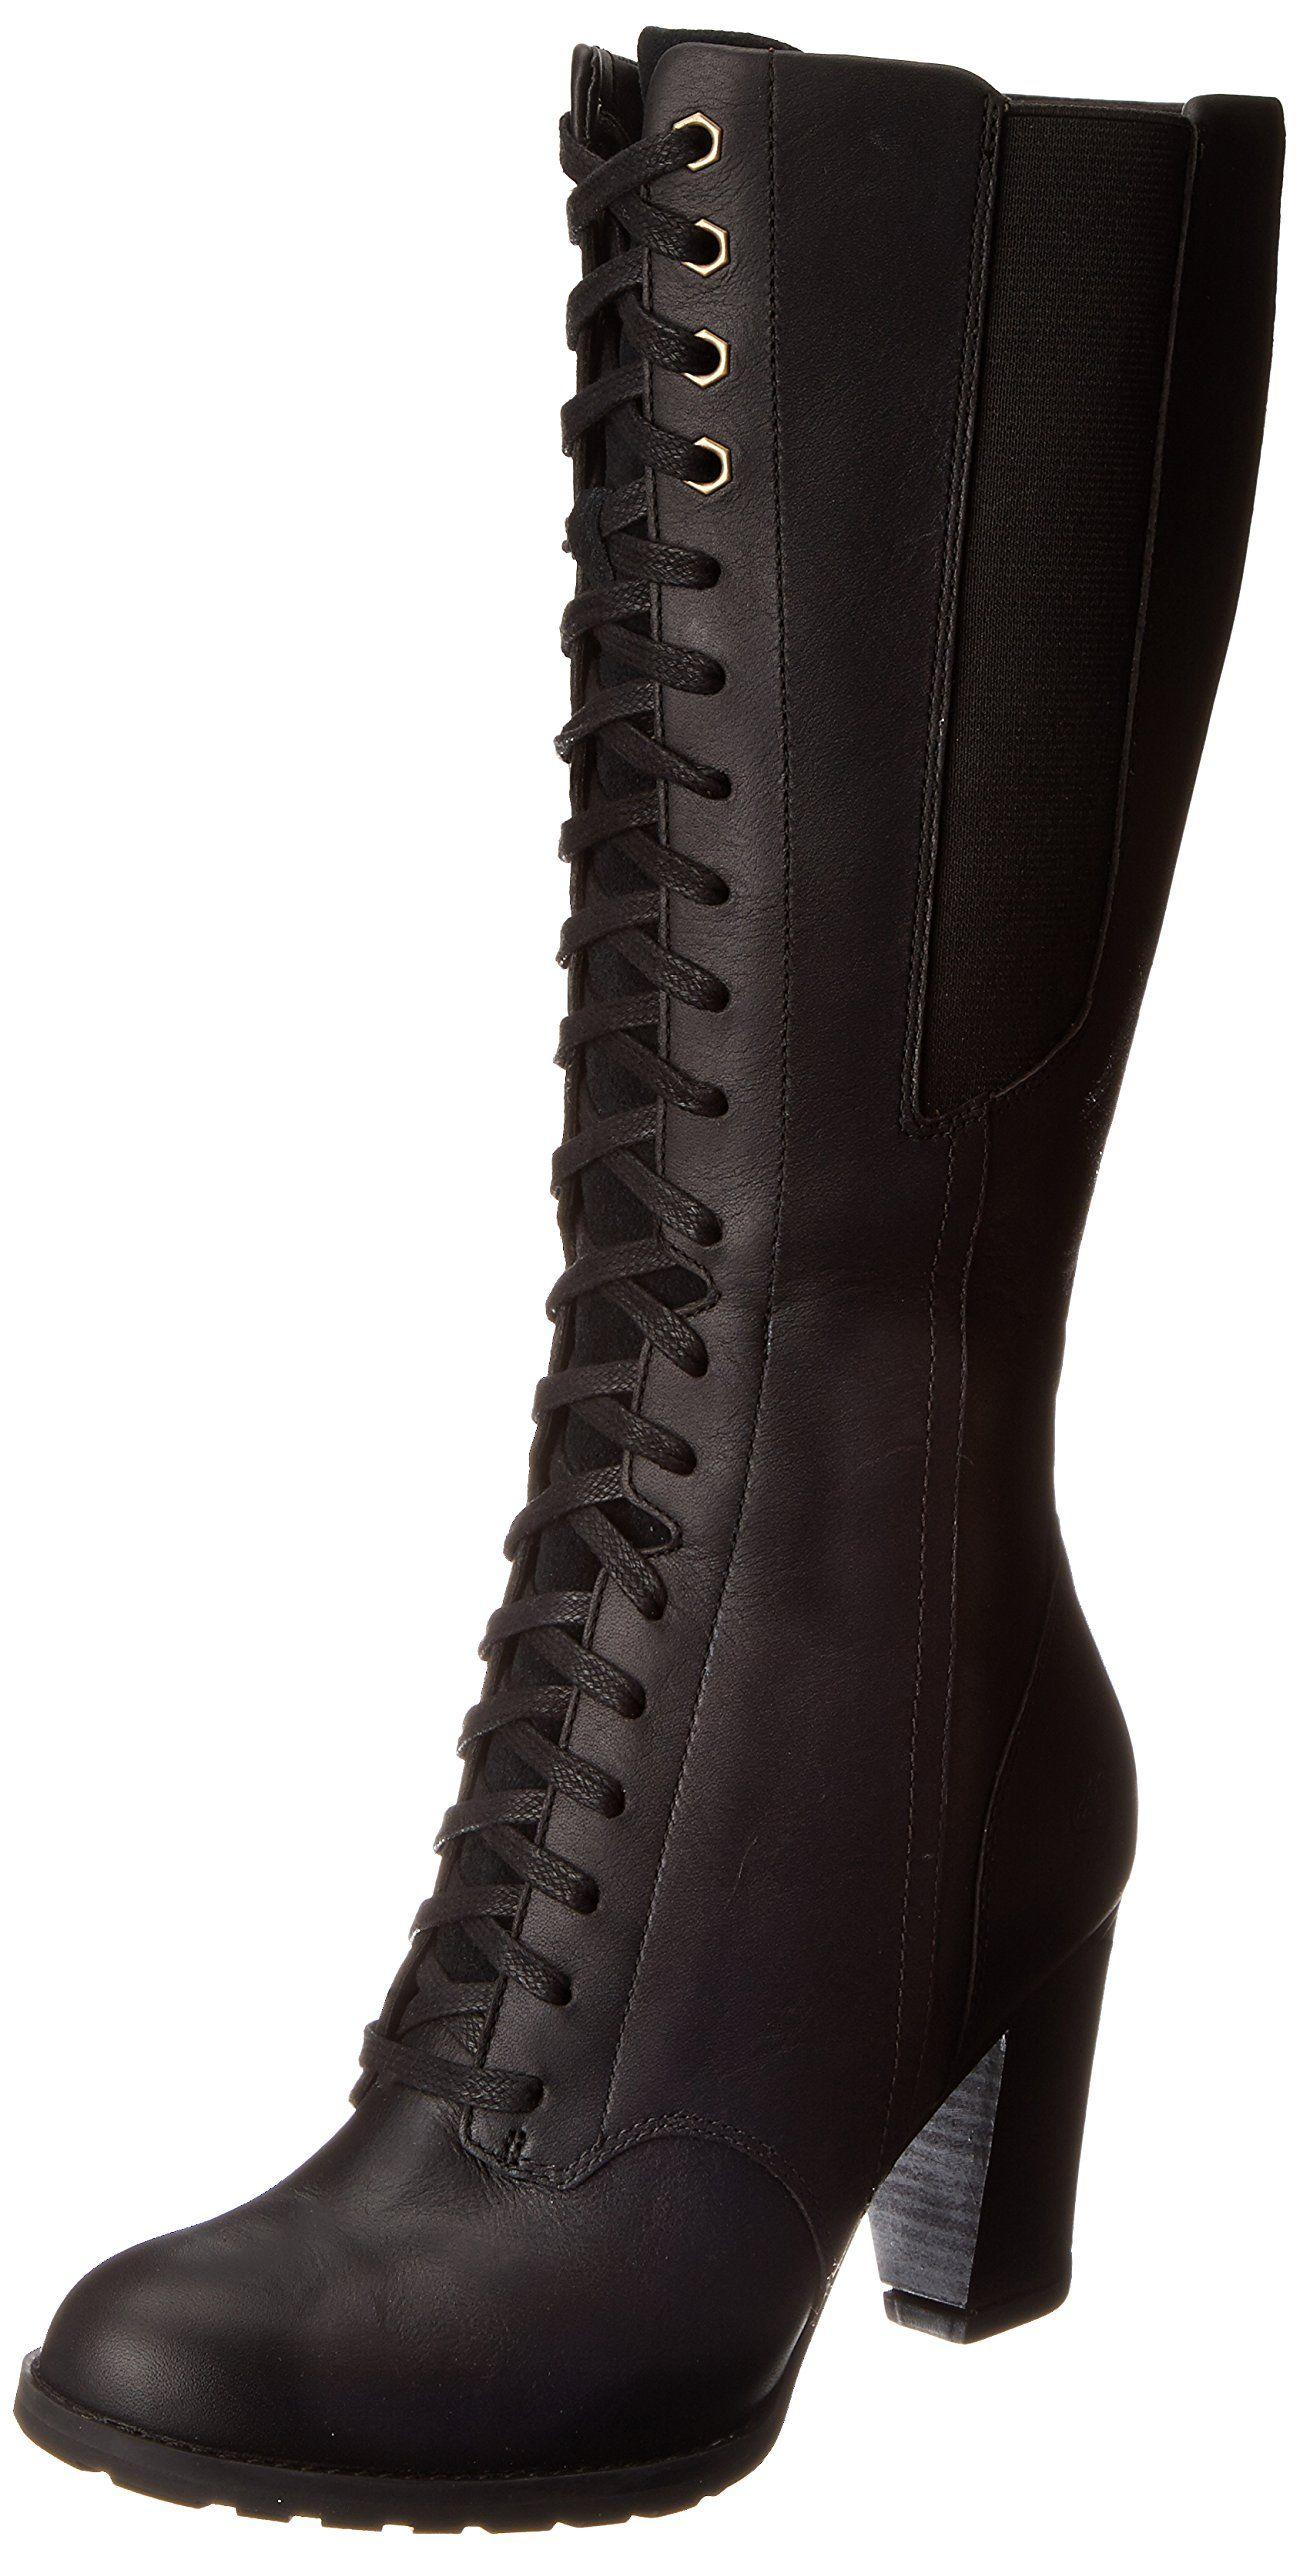 Amazon.com: Timberland Women's EK Stratham Heights Tall WP Boot: Clothing  $240